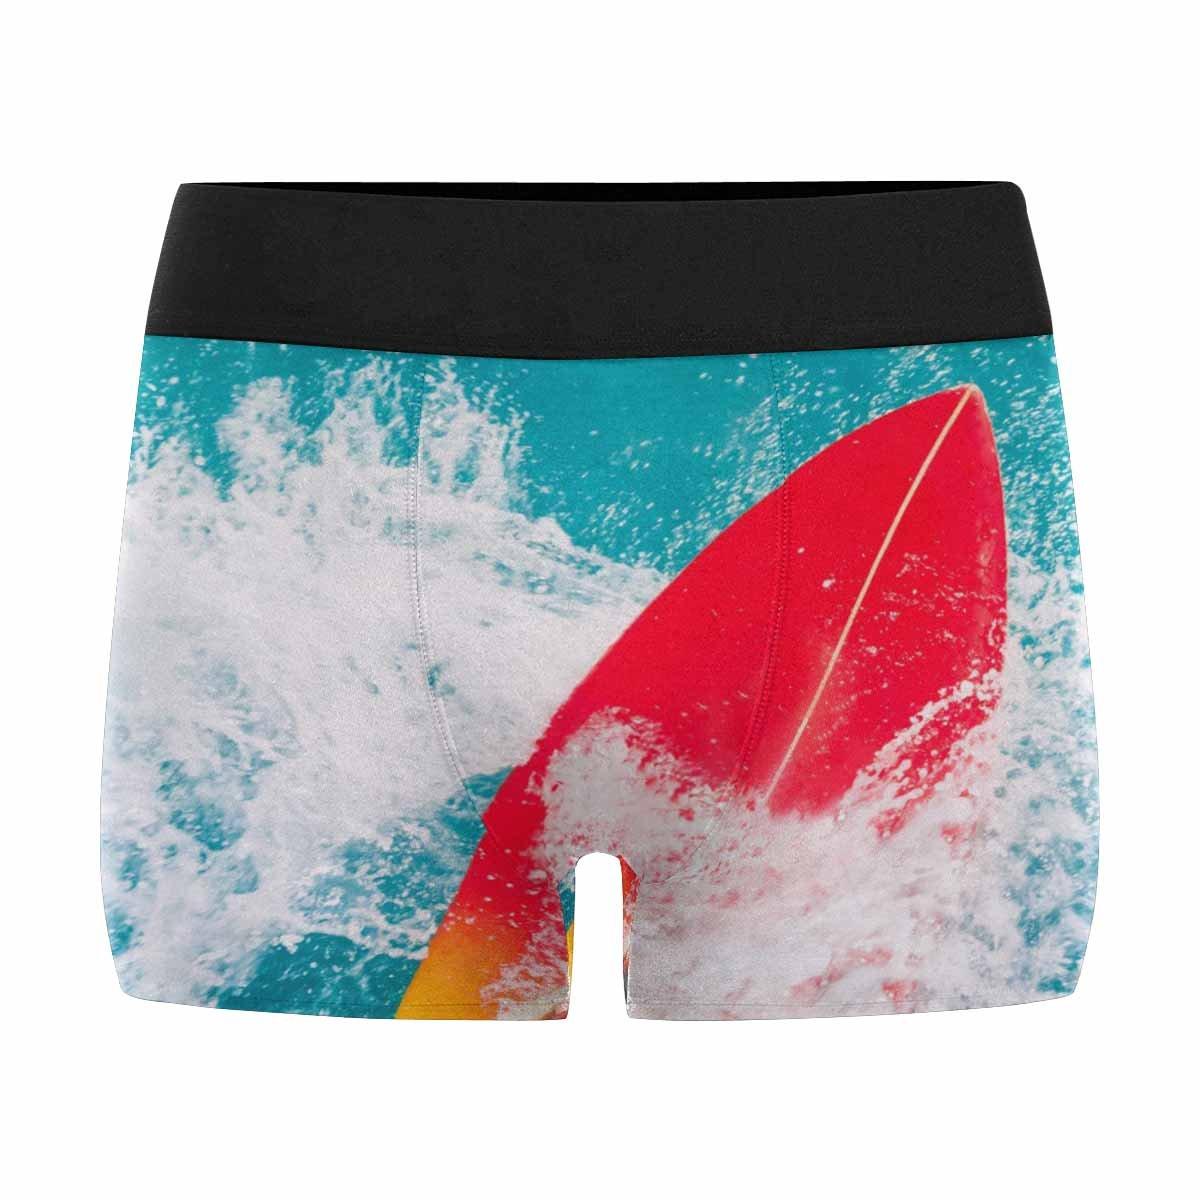 Surfing in Blue Ocean INTERESTPRINT Custom Mens Boxer Briefs Surfer on Red Surfboard Ride on Wave XS-3XL